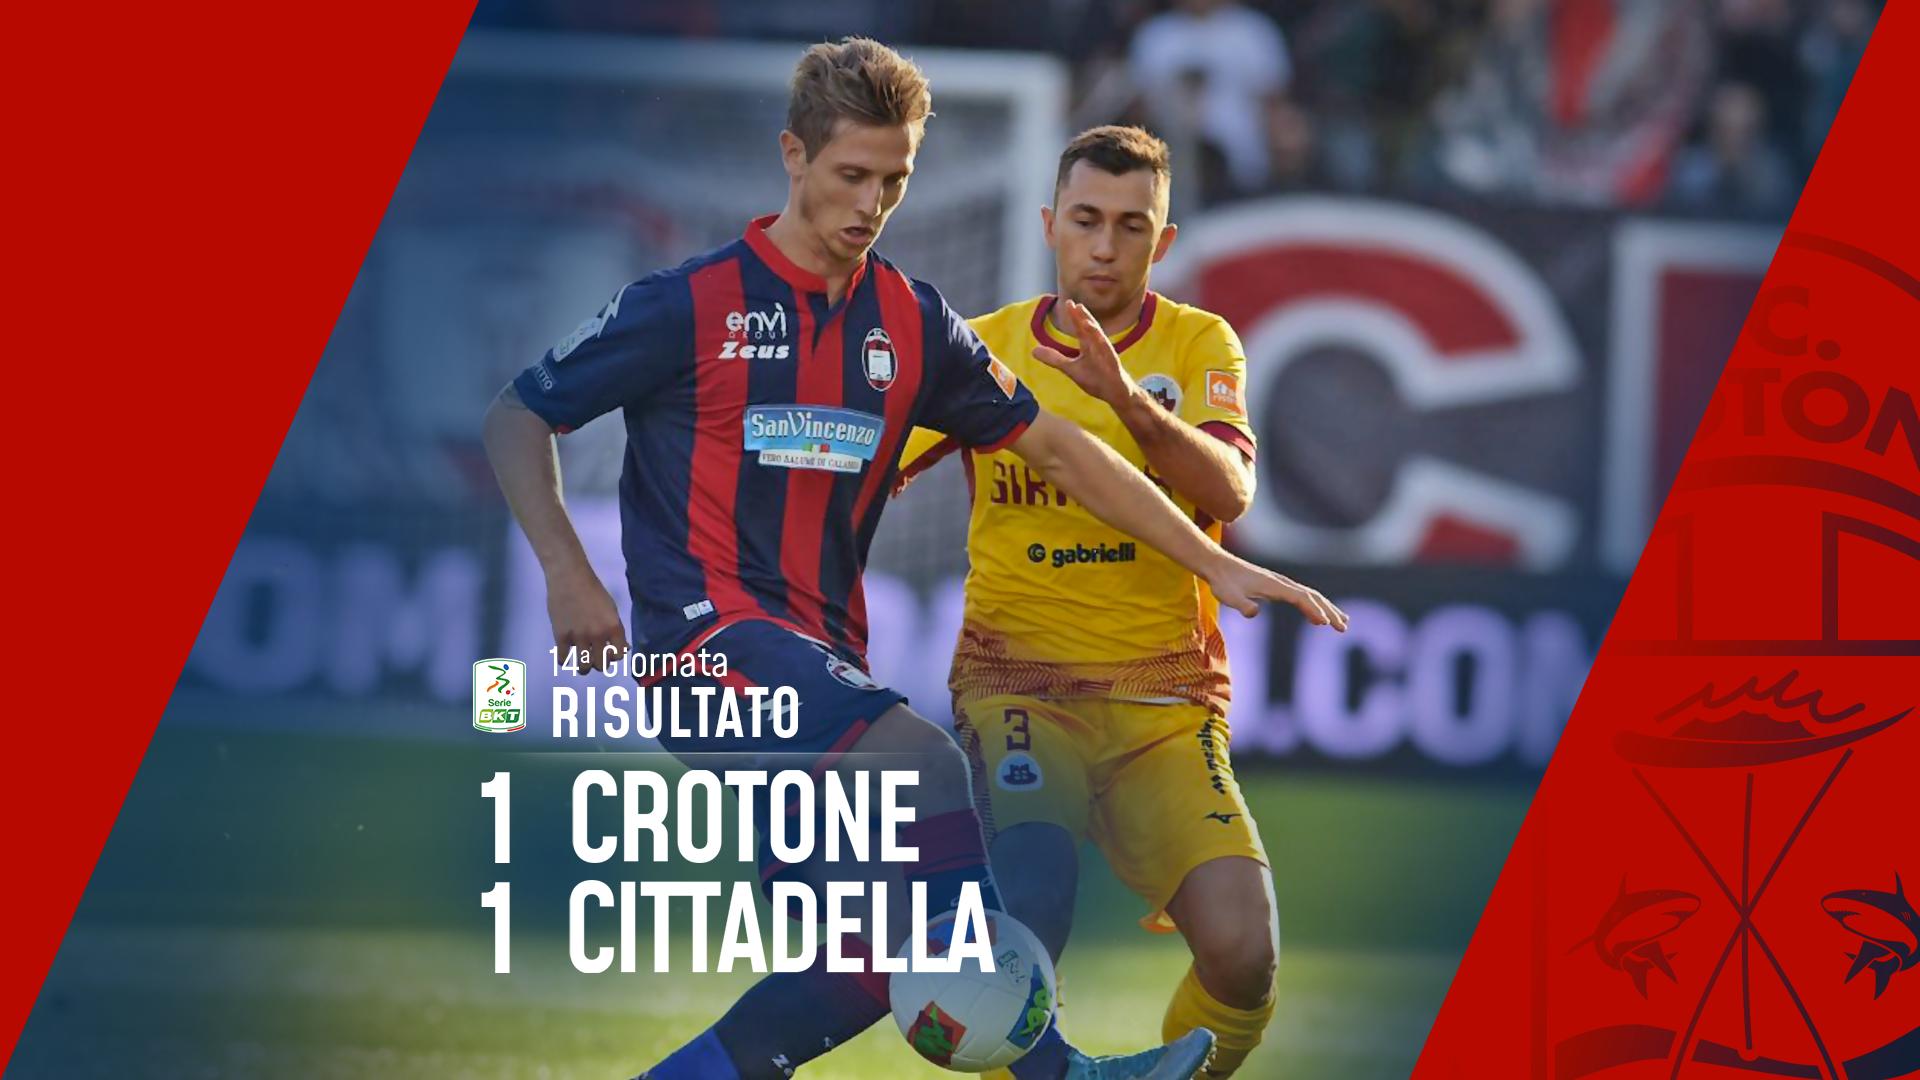 Serie BKT, 14ª giornata: Crotone-Cittadella 1-1